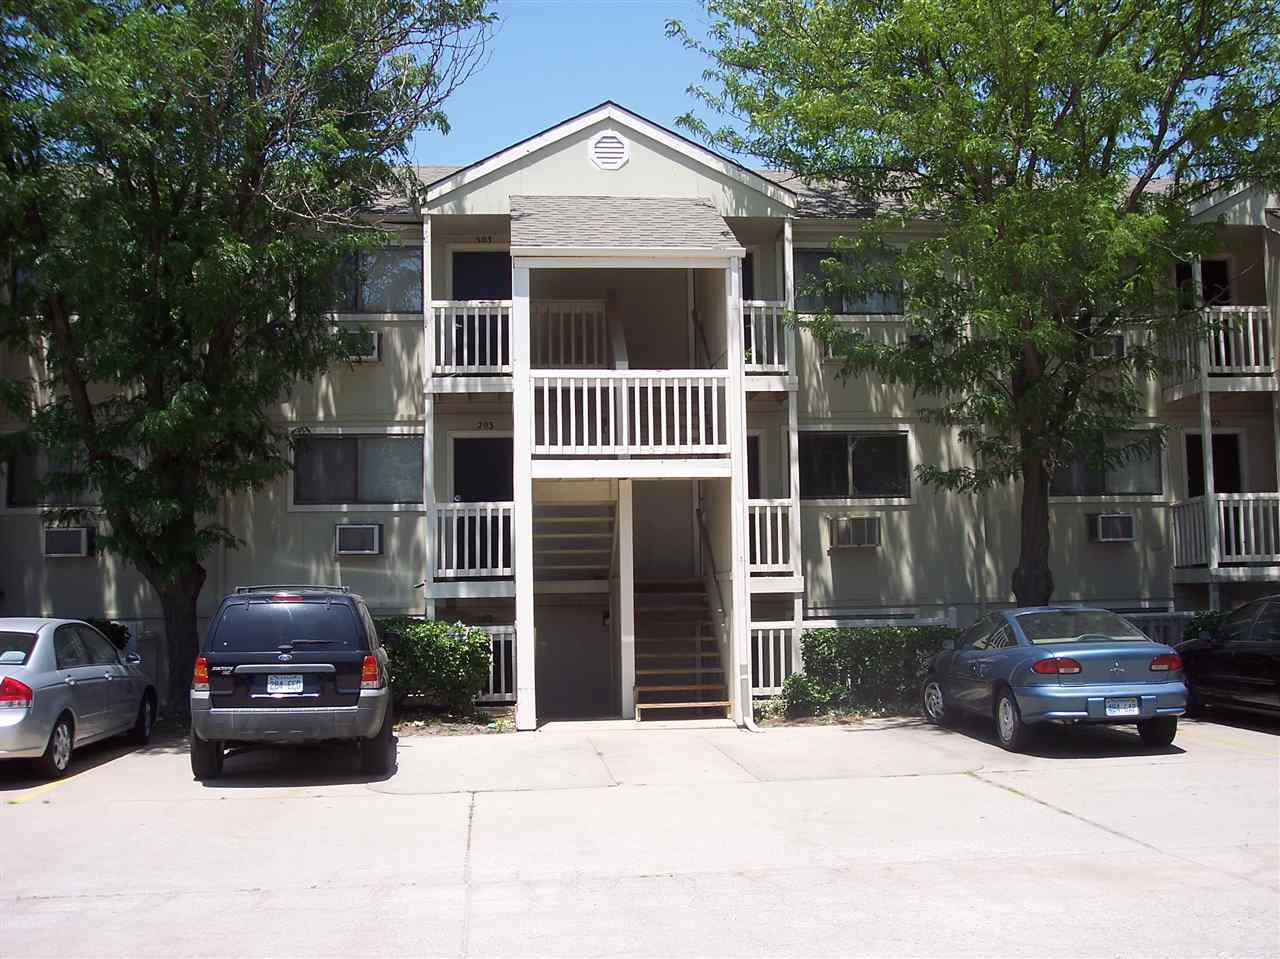 2120 N Old Manor, Wichita, KS 67208